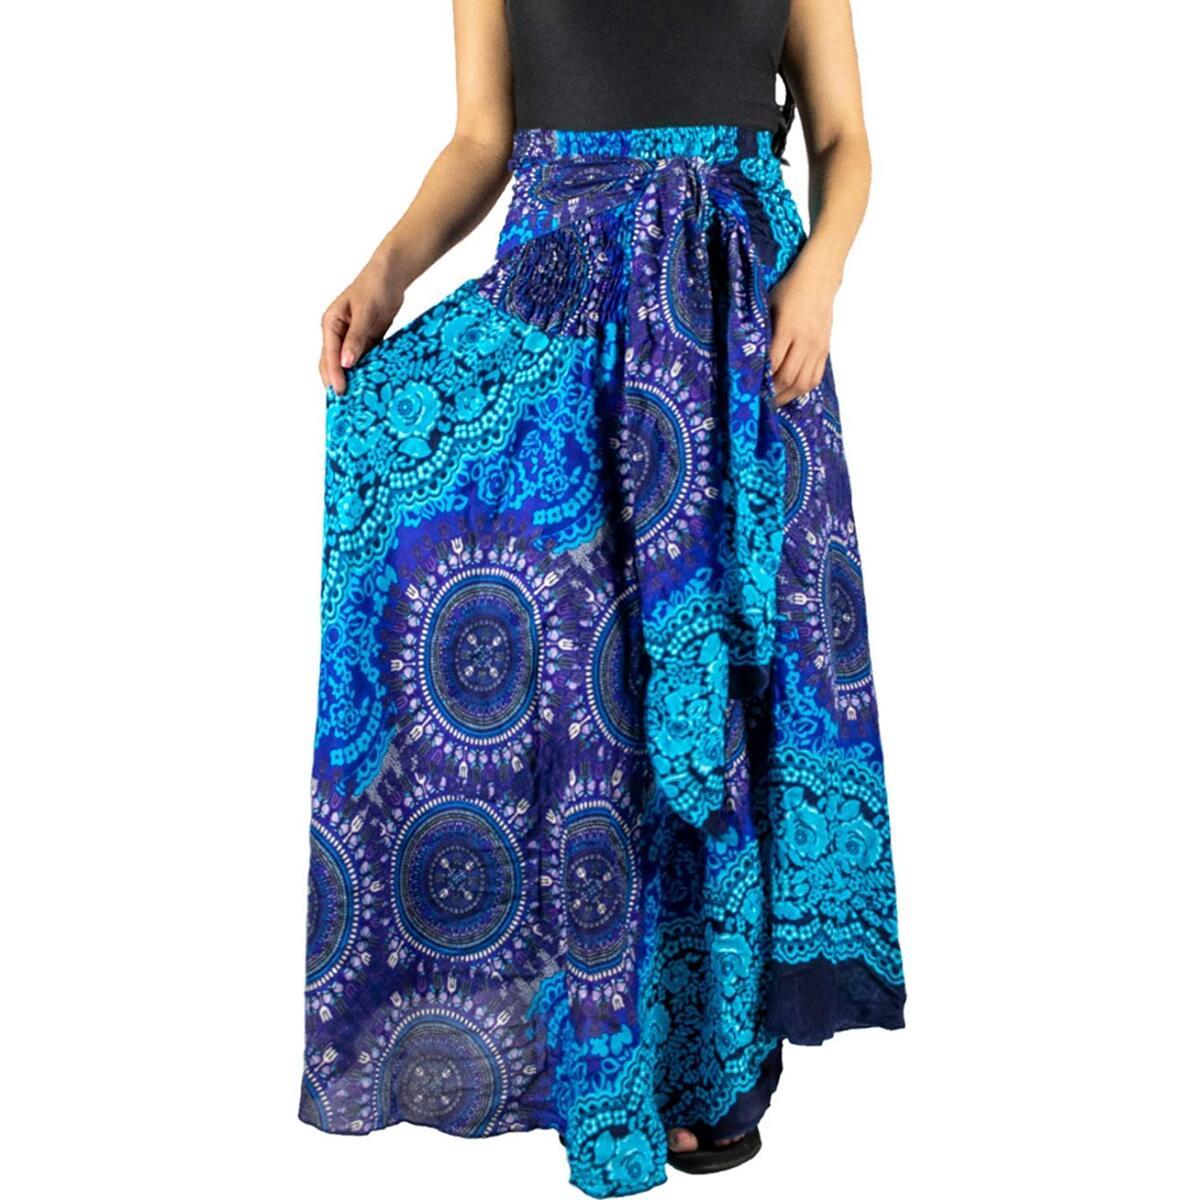 Happy Trunks Long Maxi Skirts for Women Gypsy Hippie Clothes Bohemian Boho Dress Plus (Blue S-M)